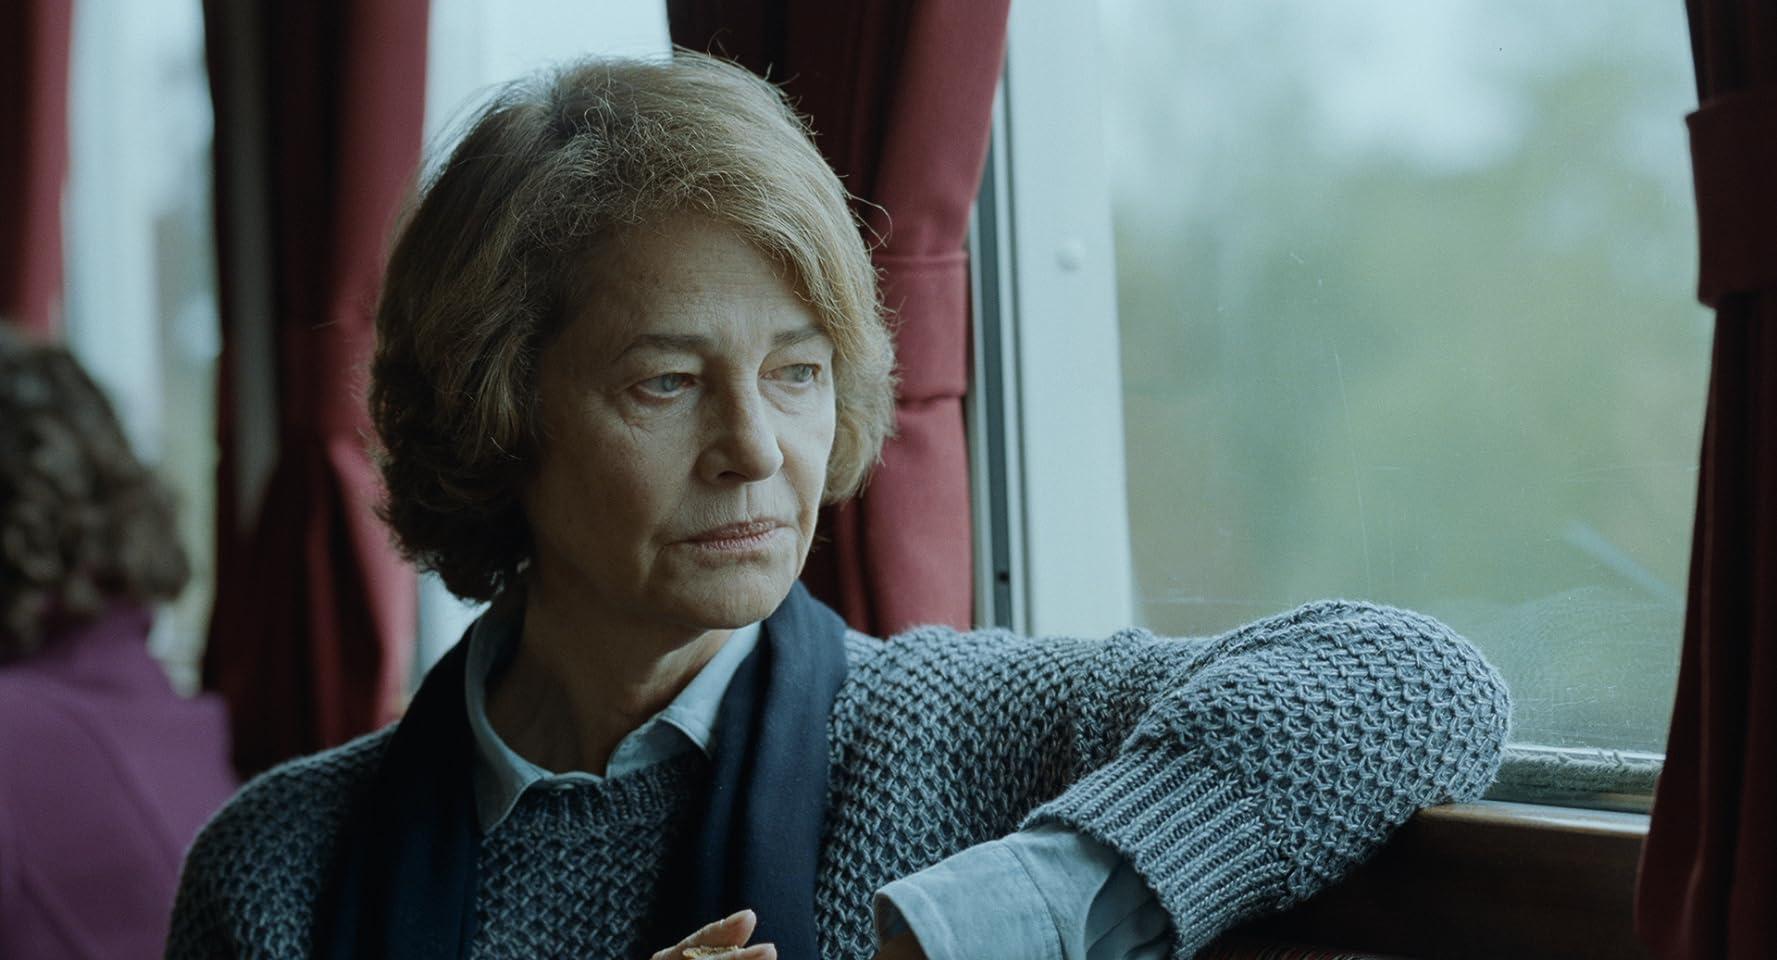 Charlotte Rampling in 45 Years (2015)